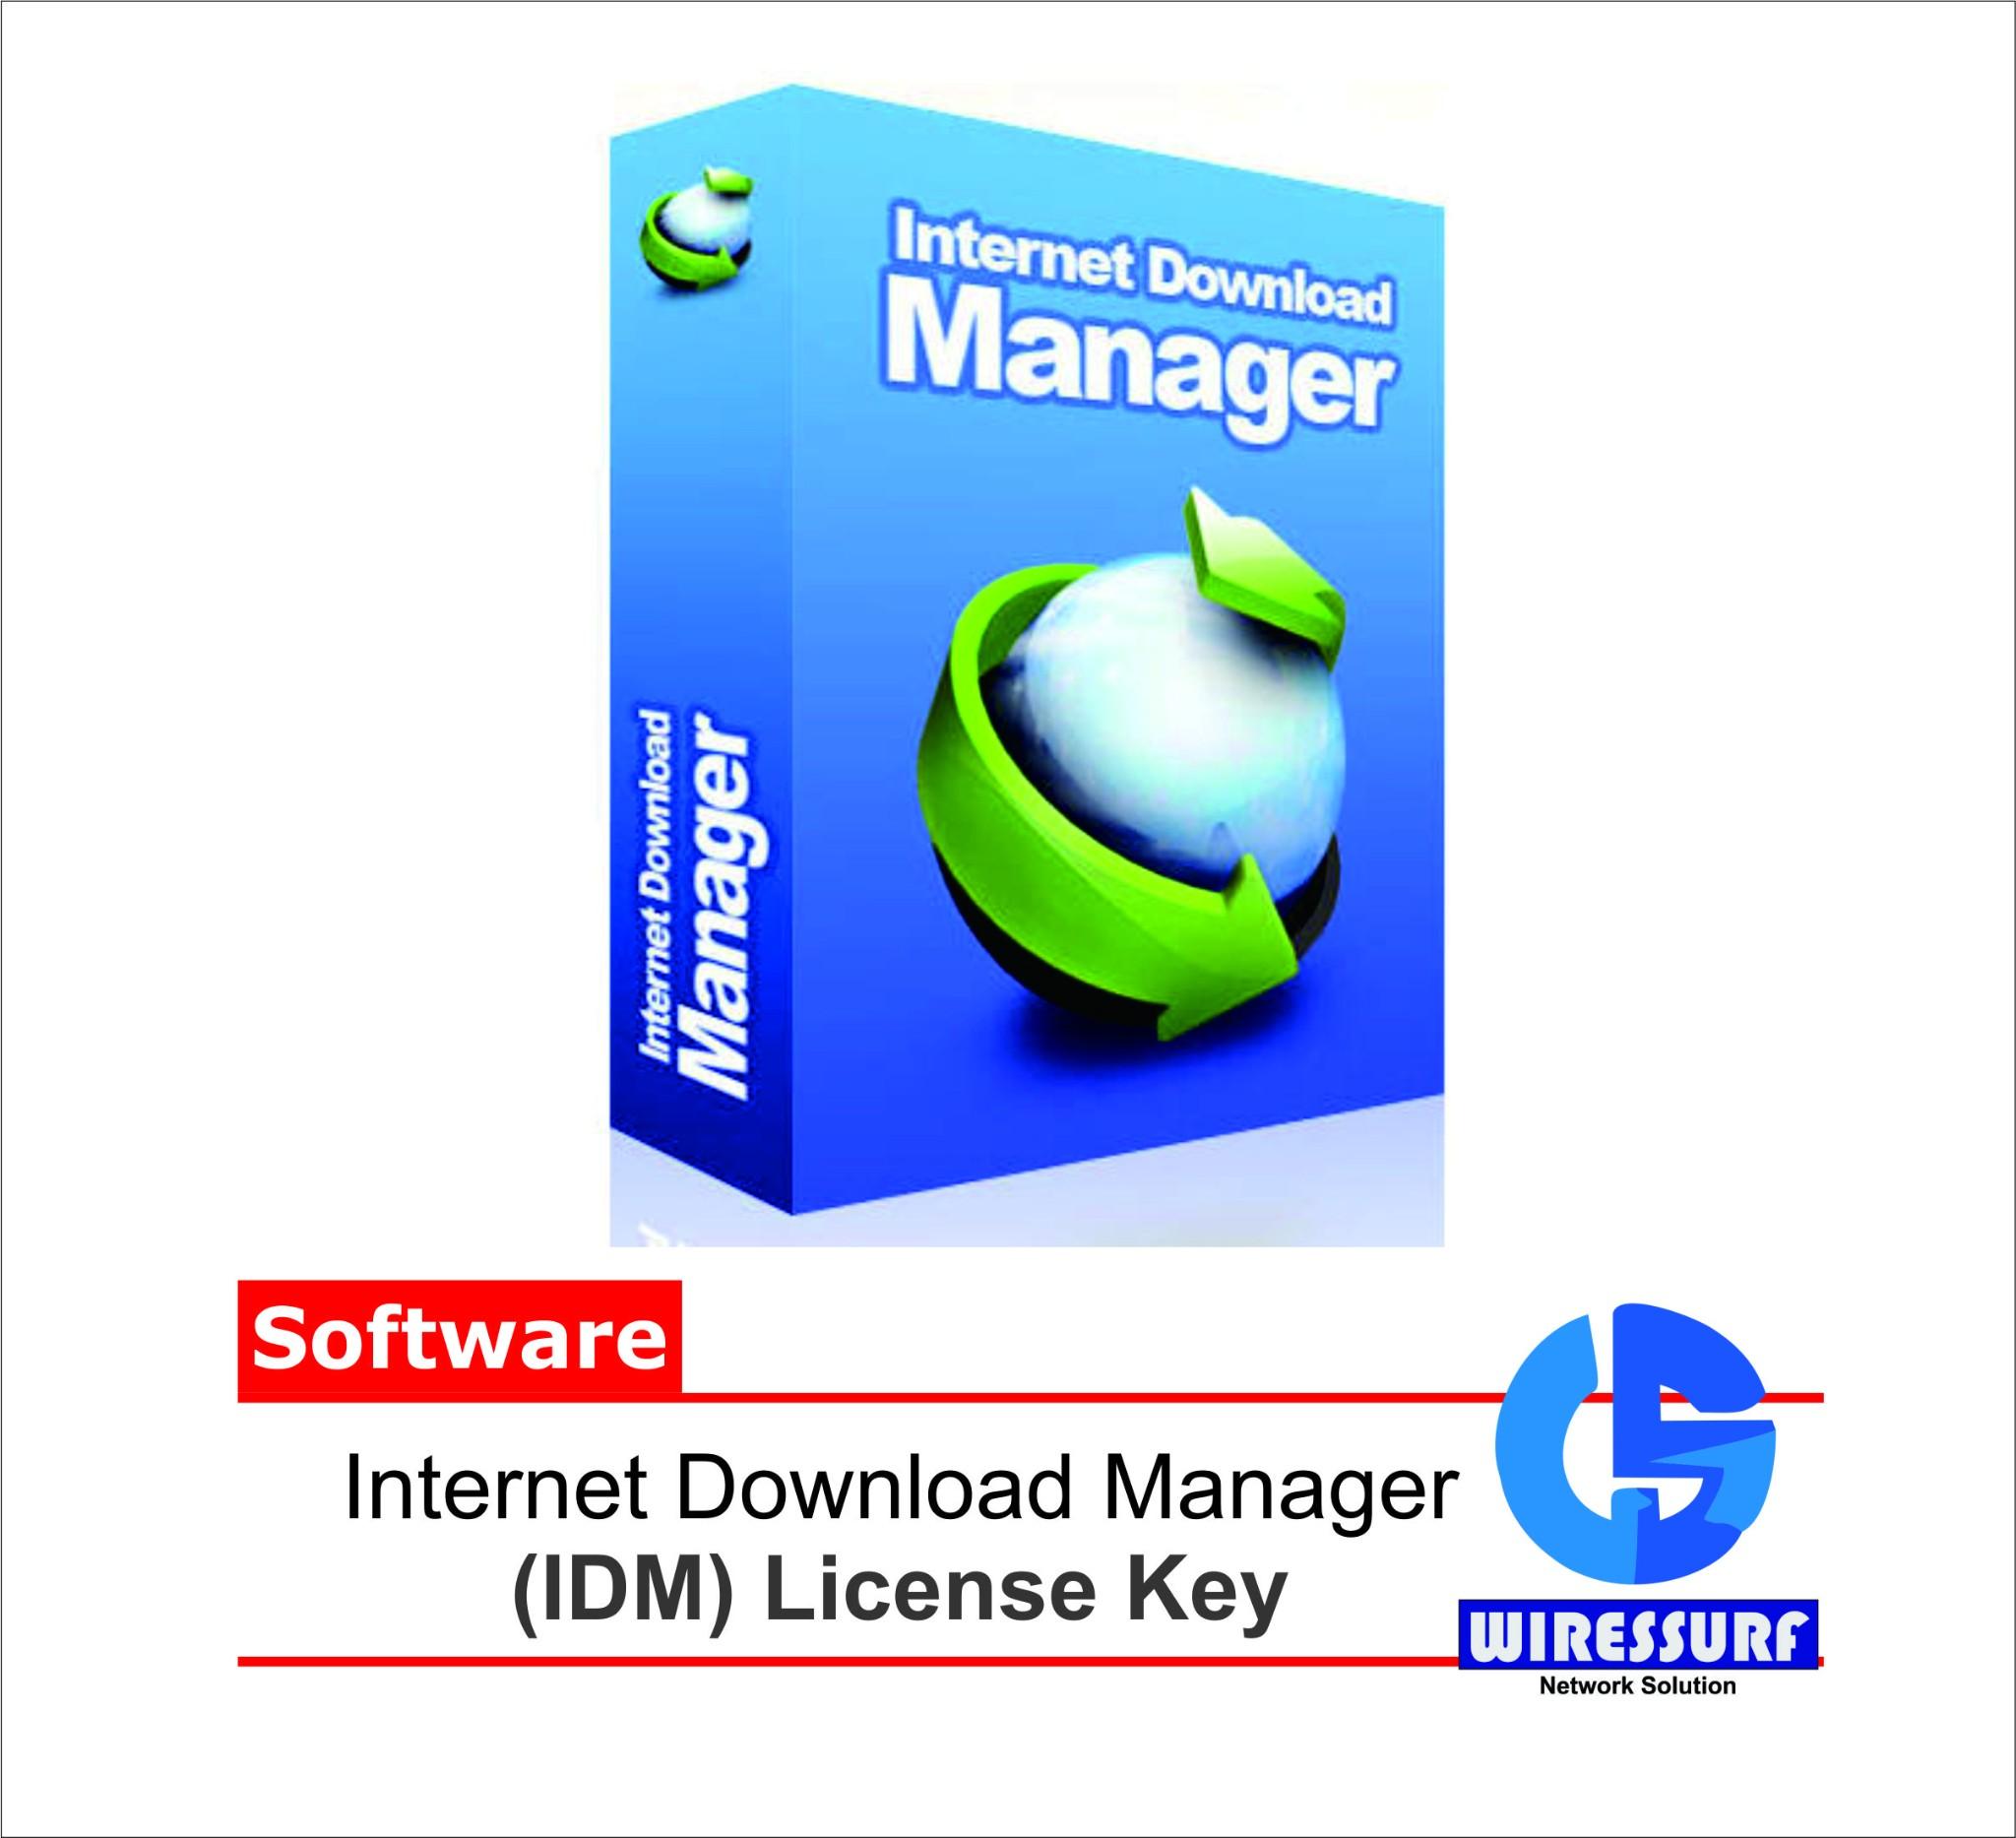 Internet Download Manager 7.2 Original Serial Key Crack : Loticou